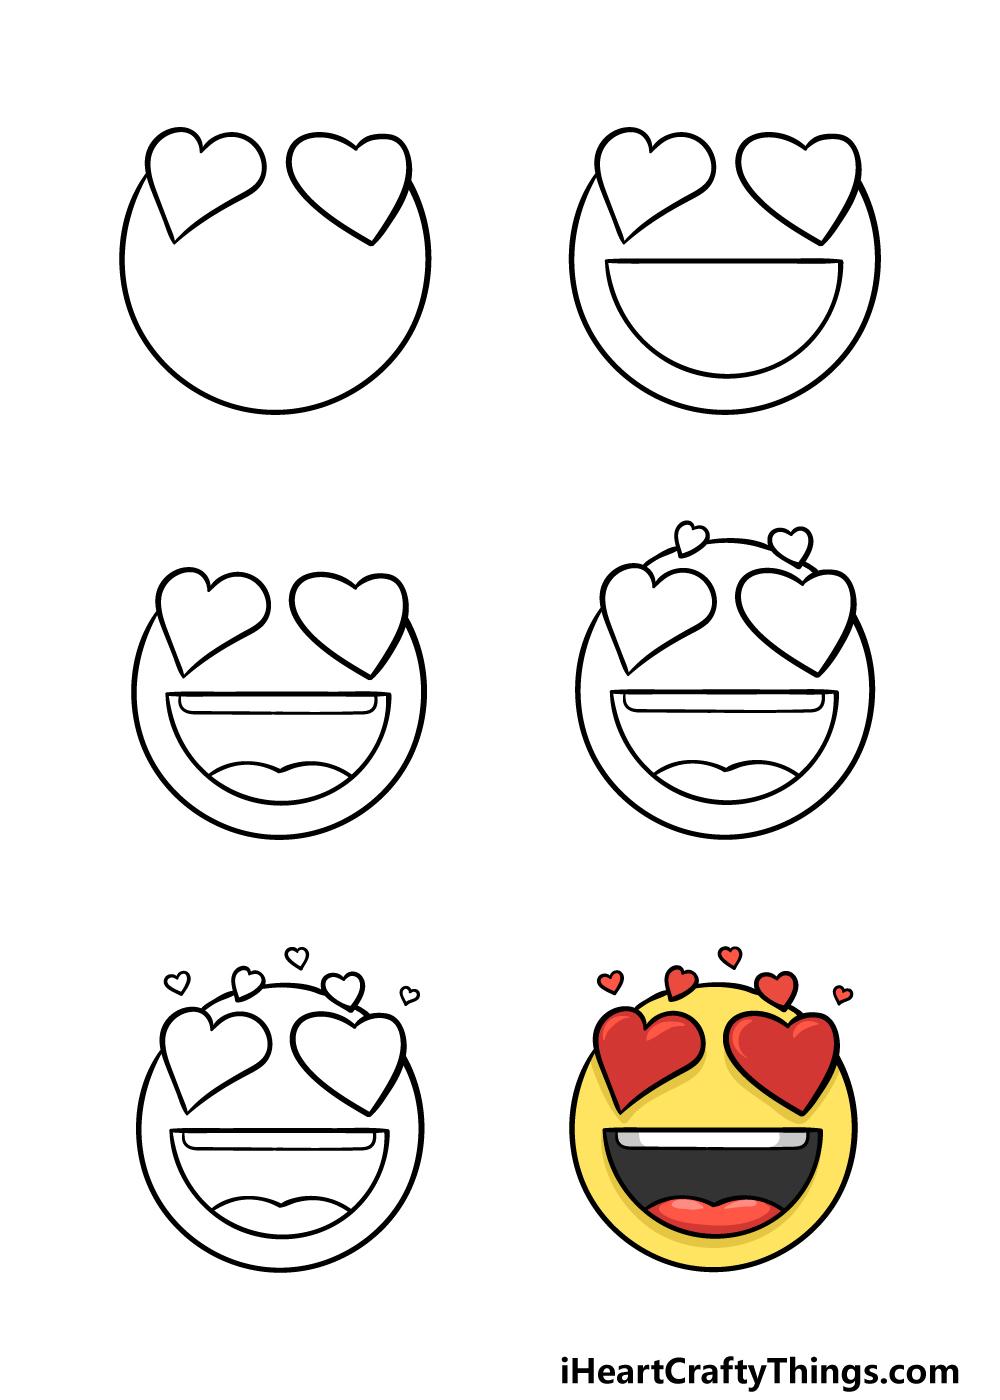 how to draw emoji in 6 steps